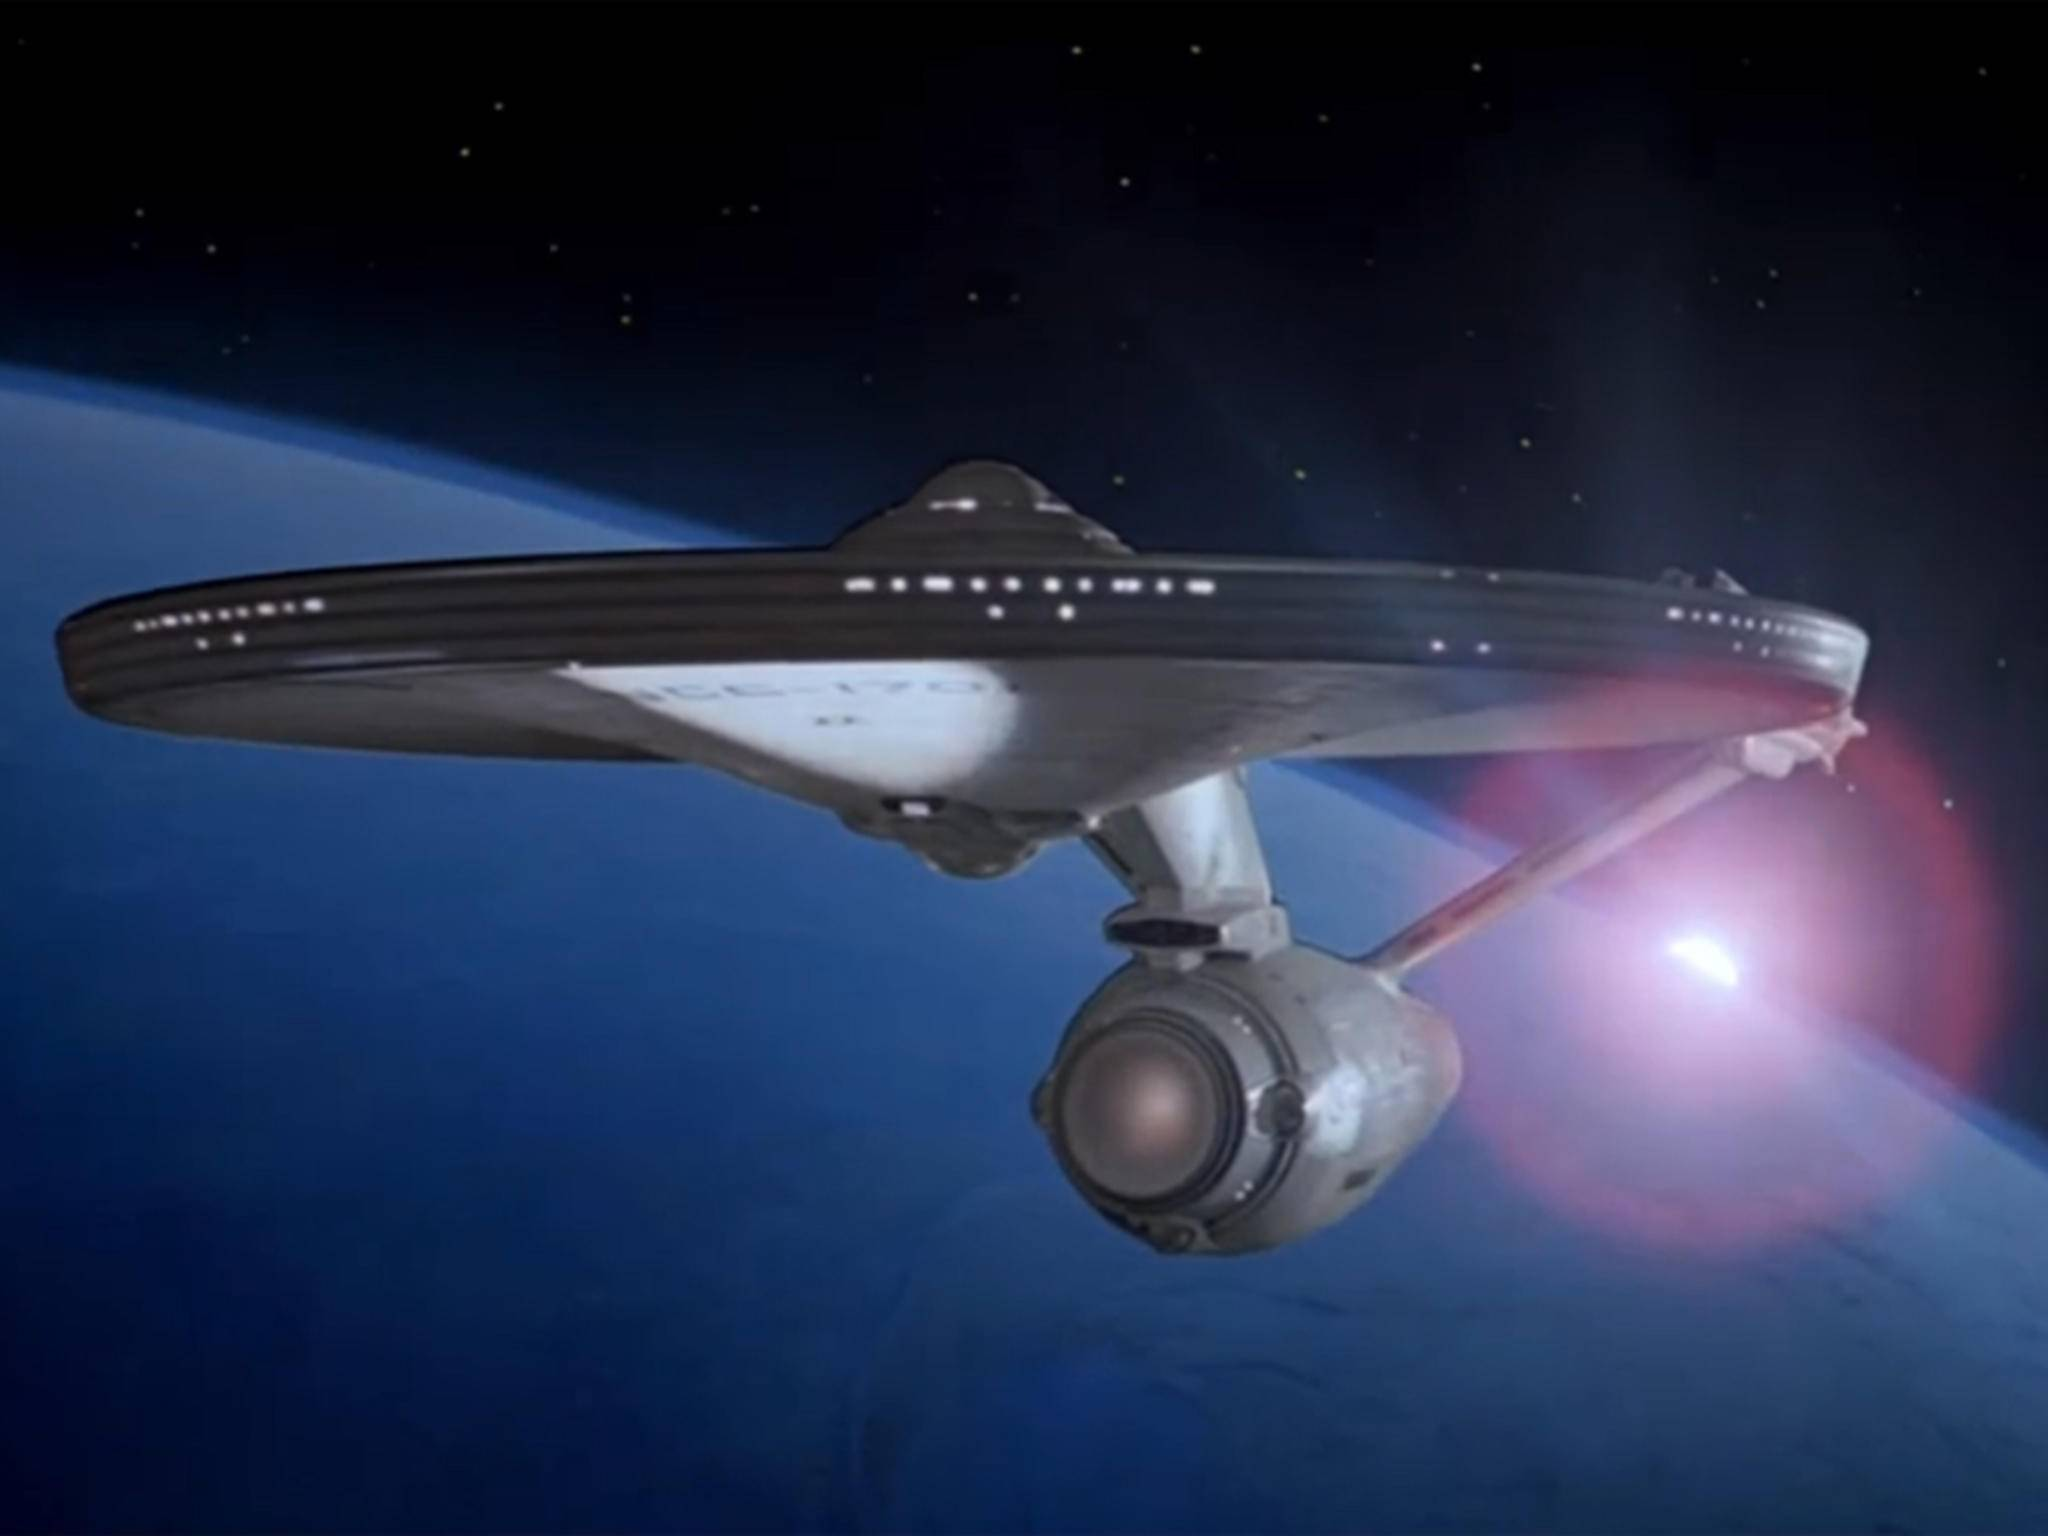 star trek enterprise screenshot facebook.jpg